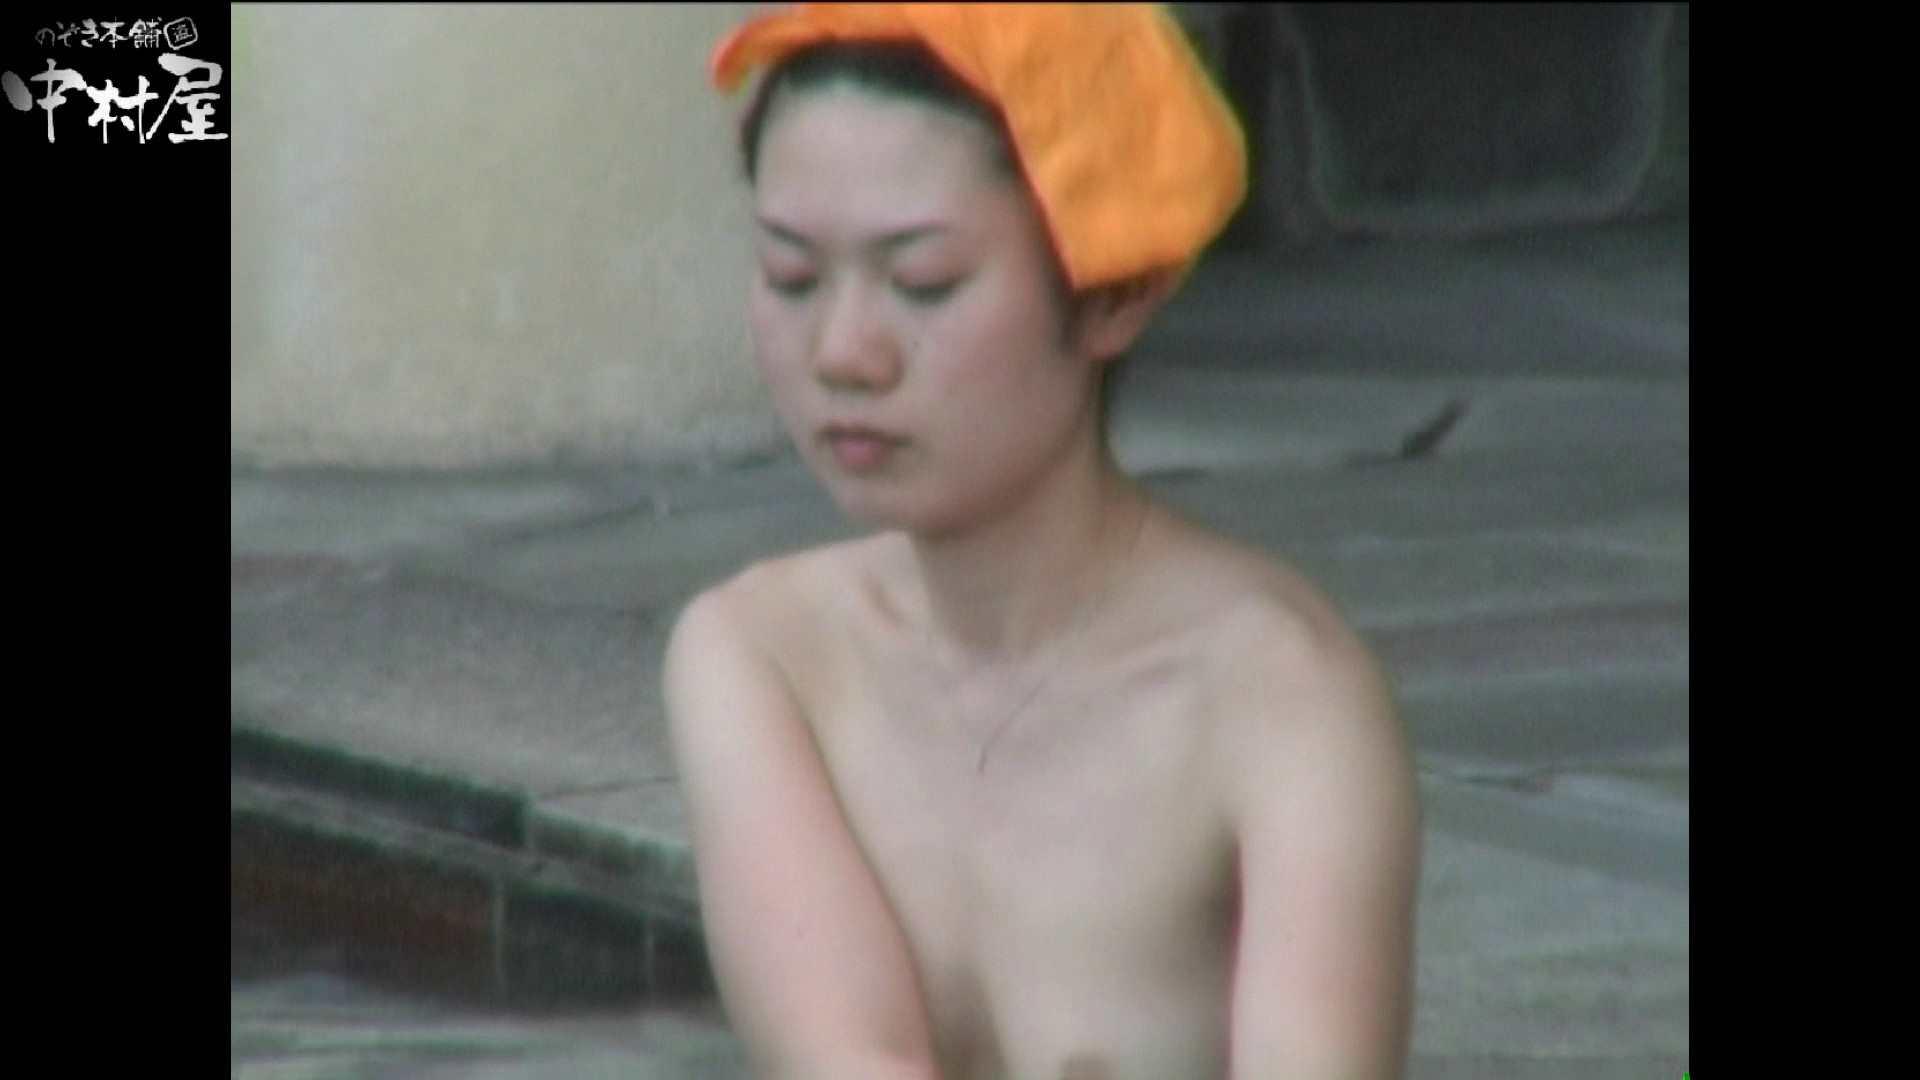 Aquaな露天風呂Vol.978 OLセックス | 露天  77画像 73